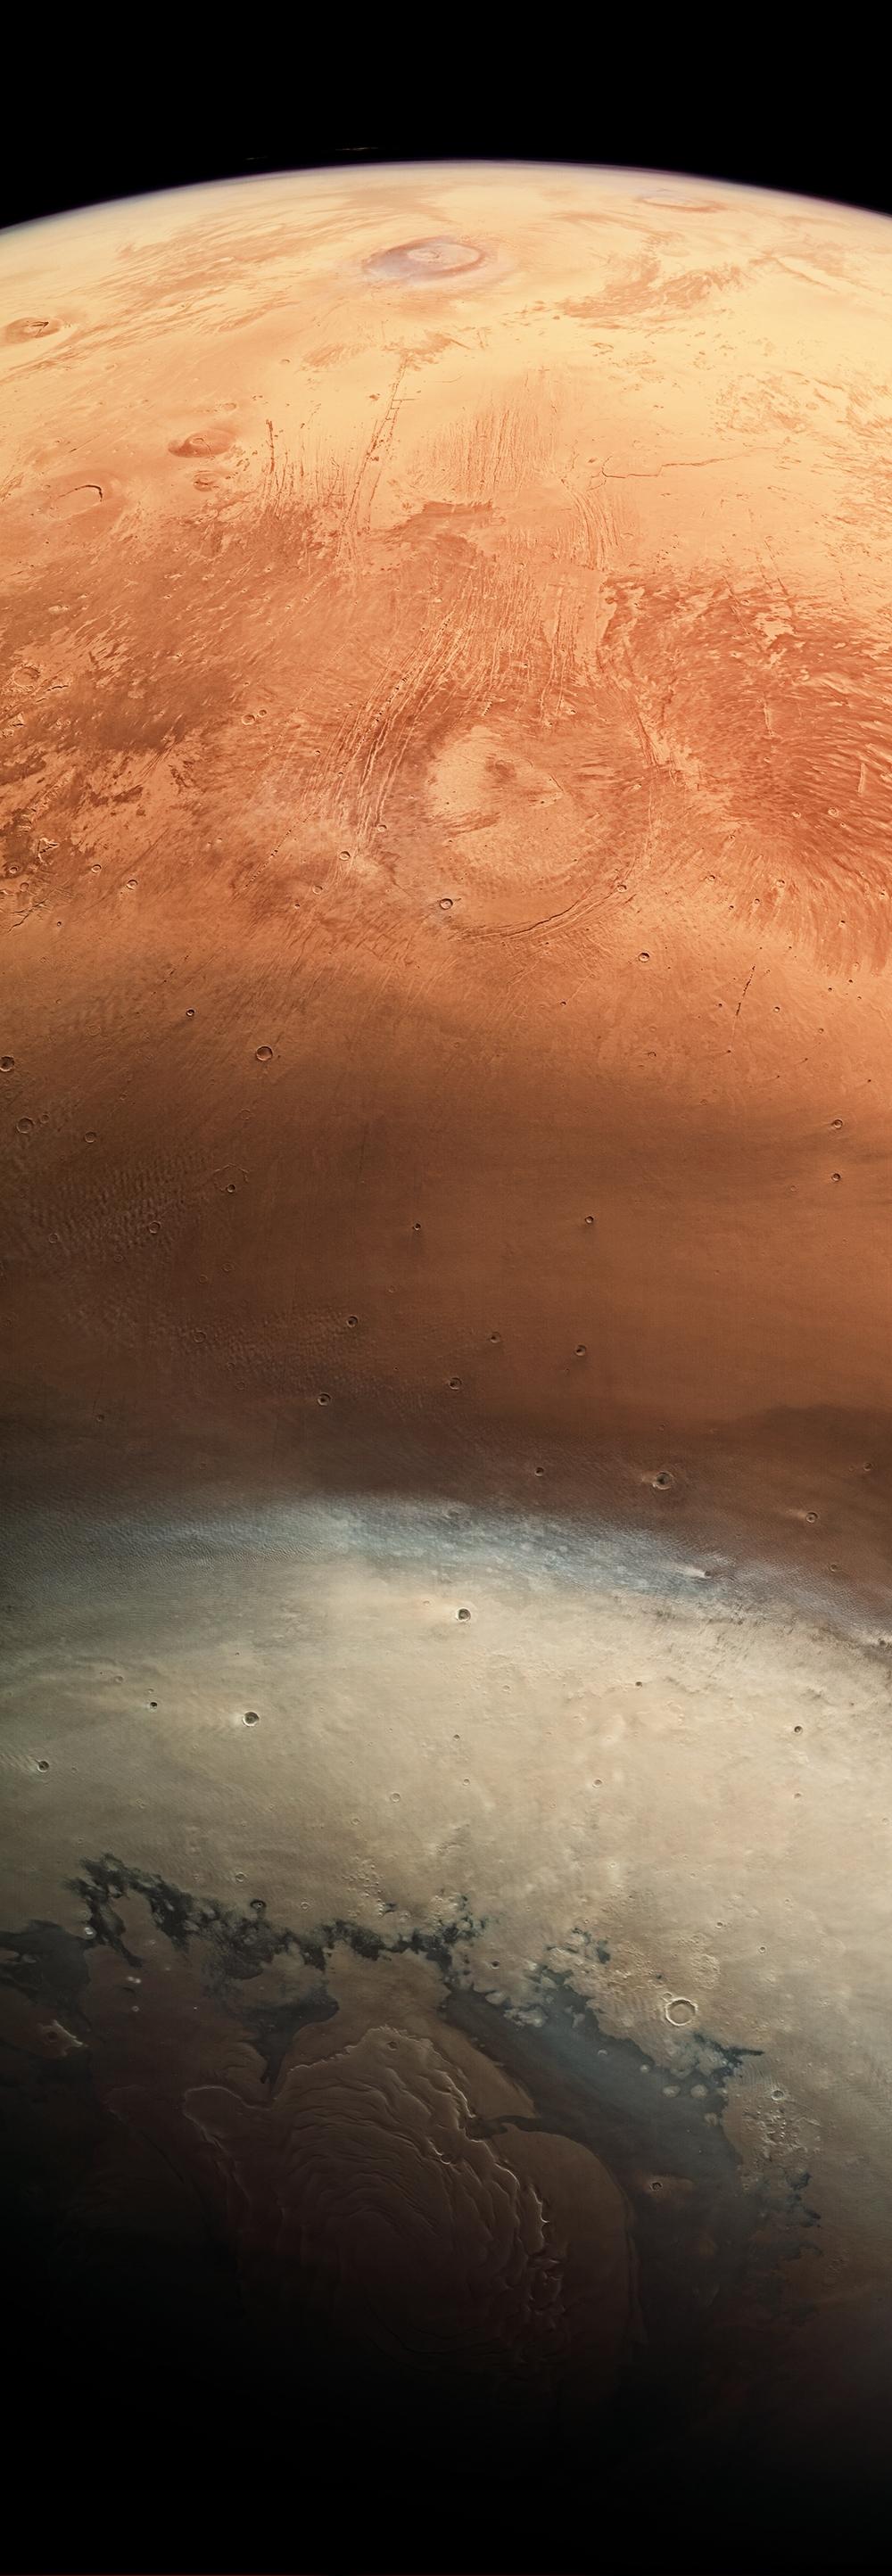 Mars upside down